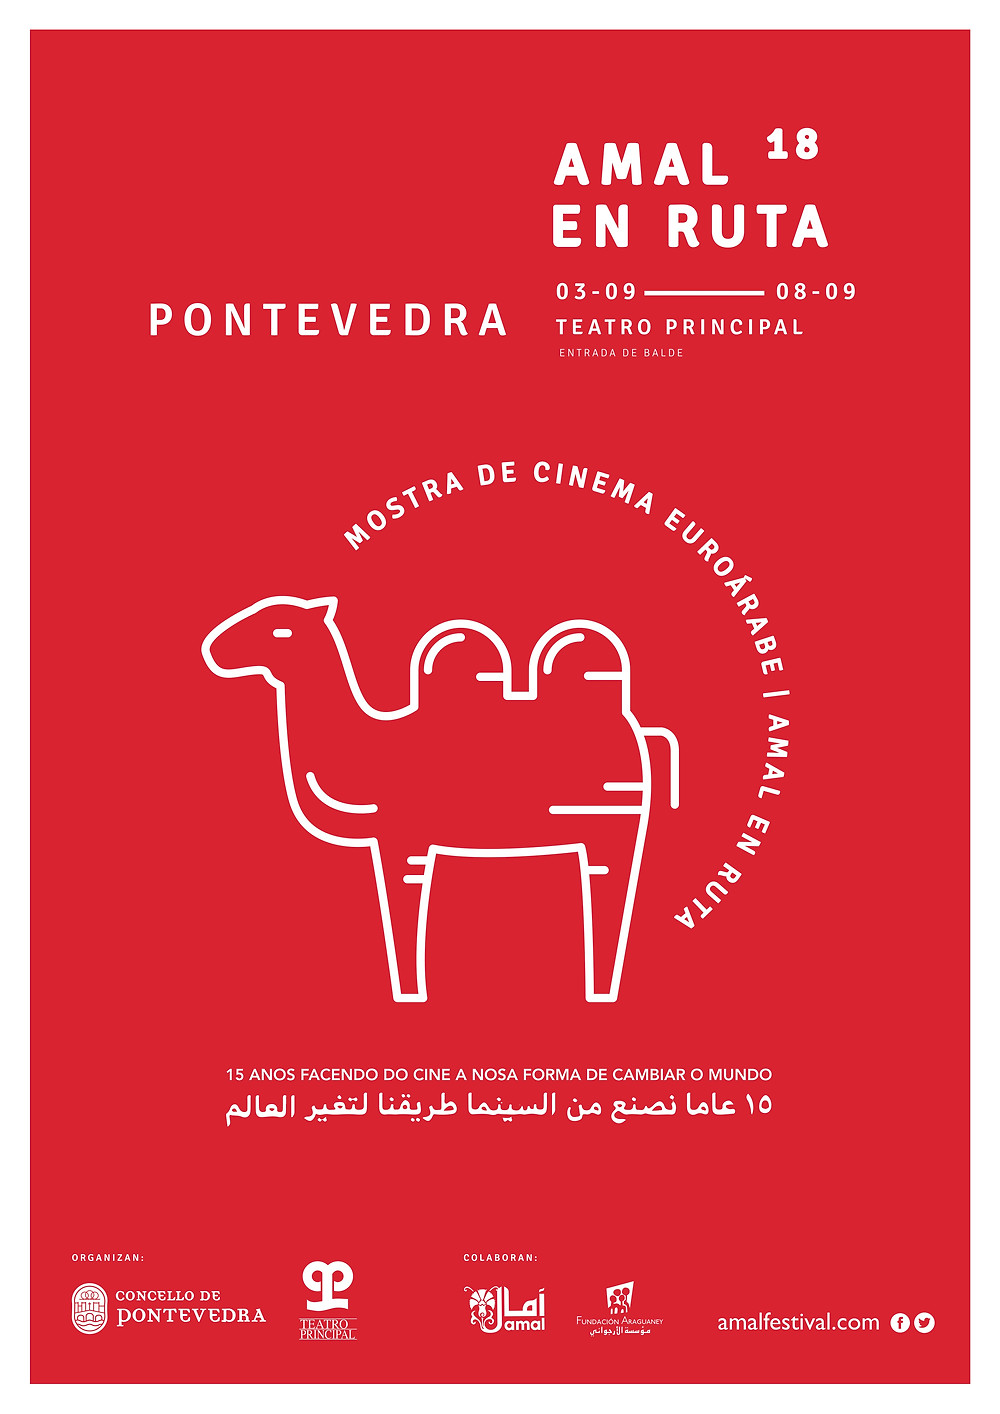 Programa de Amal en Ruta 18 Pontevedra